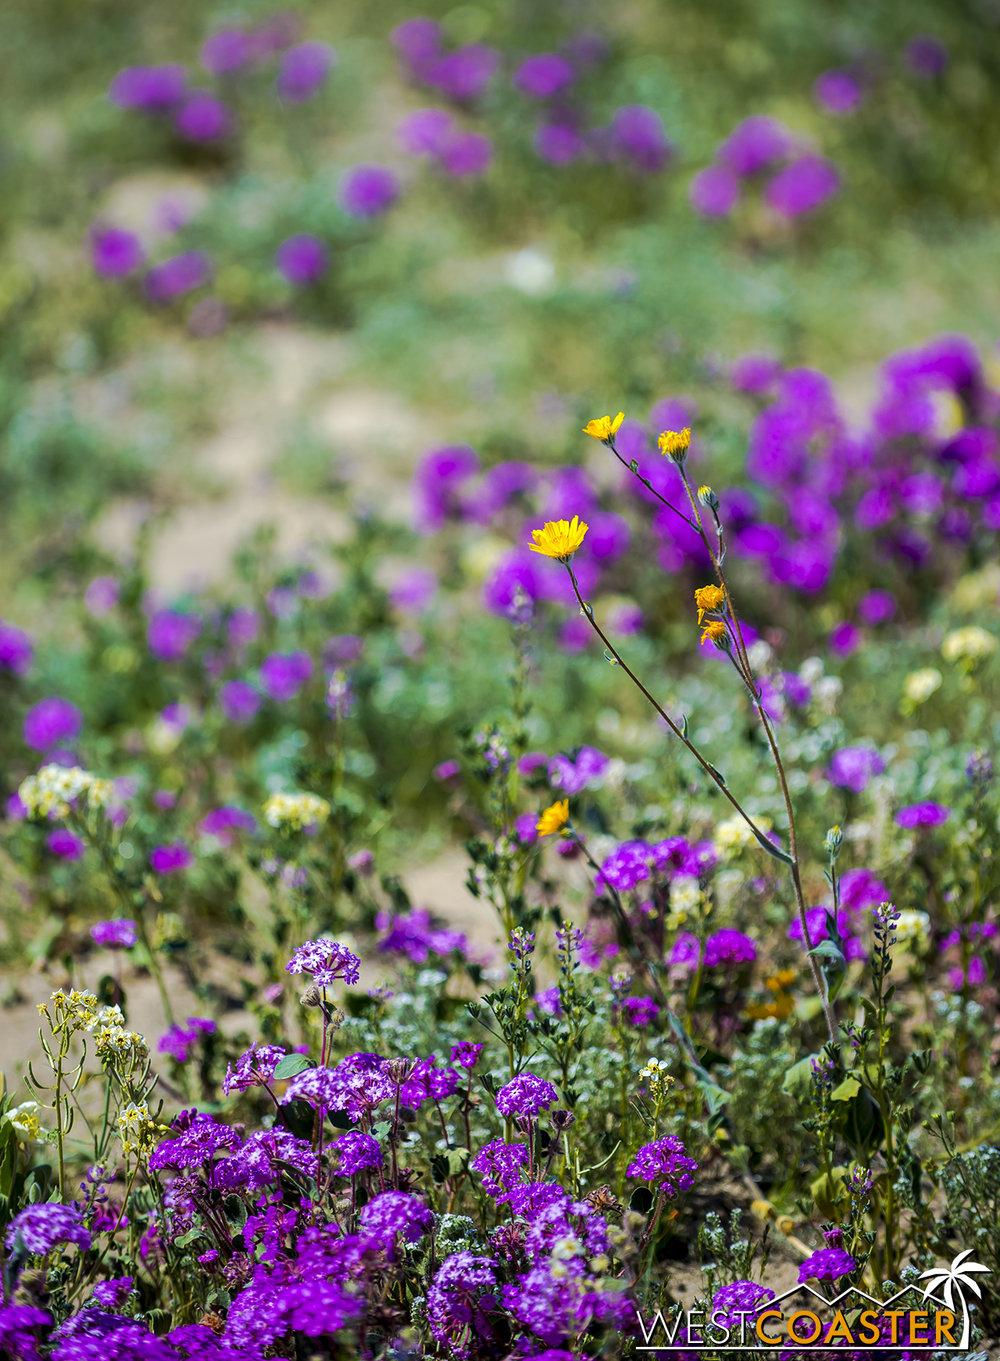 BorregoSprings-17_0316-B-Flowers-0025.jpg